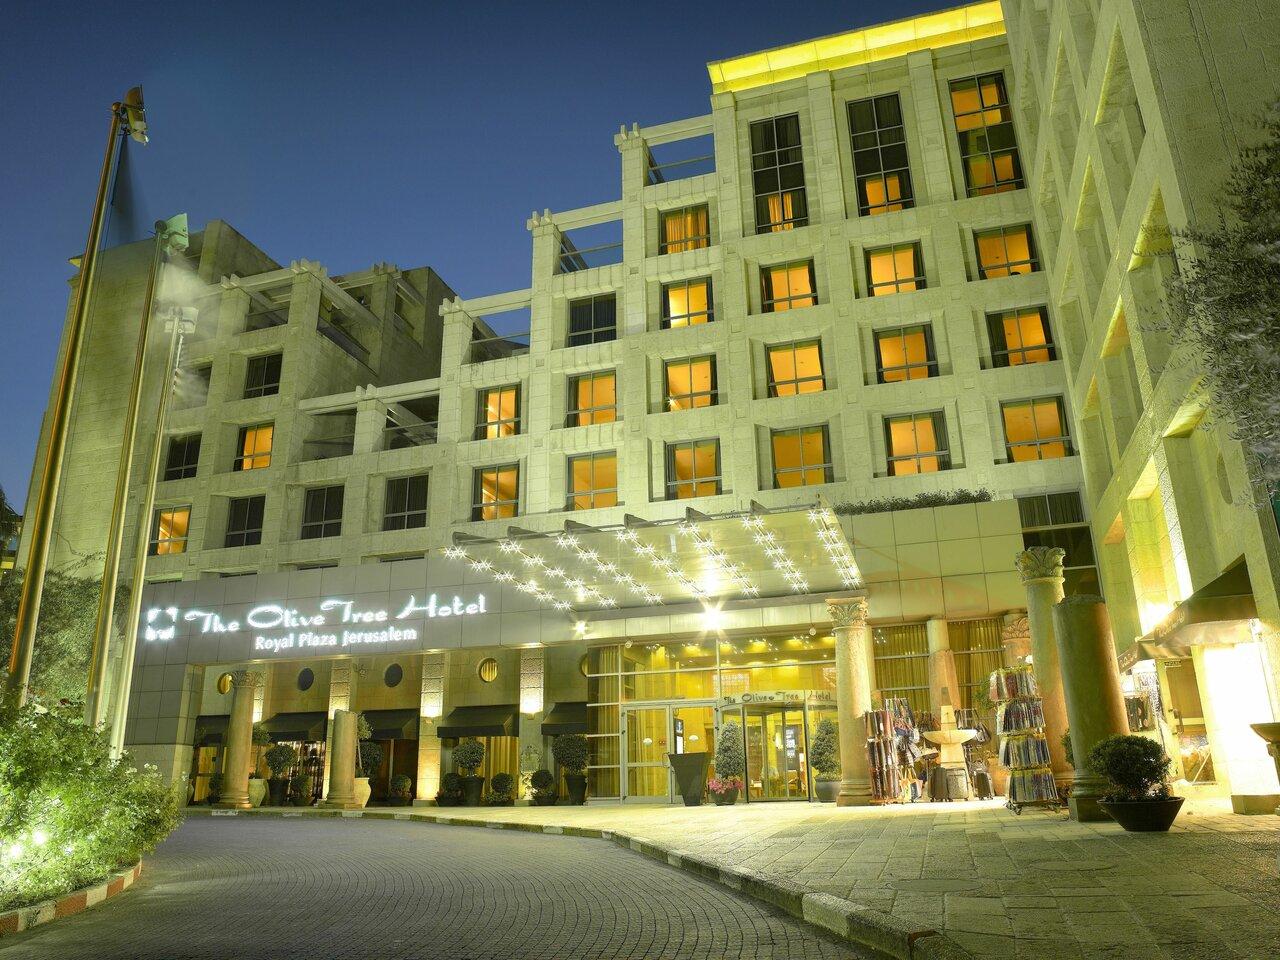 Olive Tree Royal Plaza